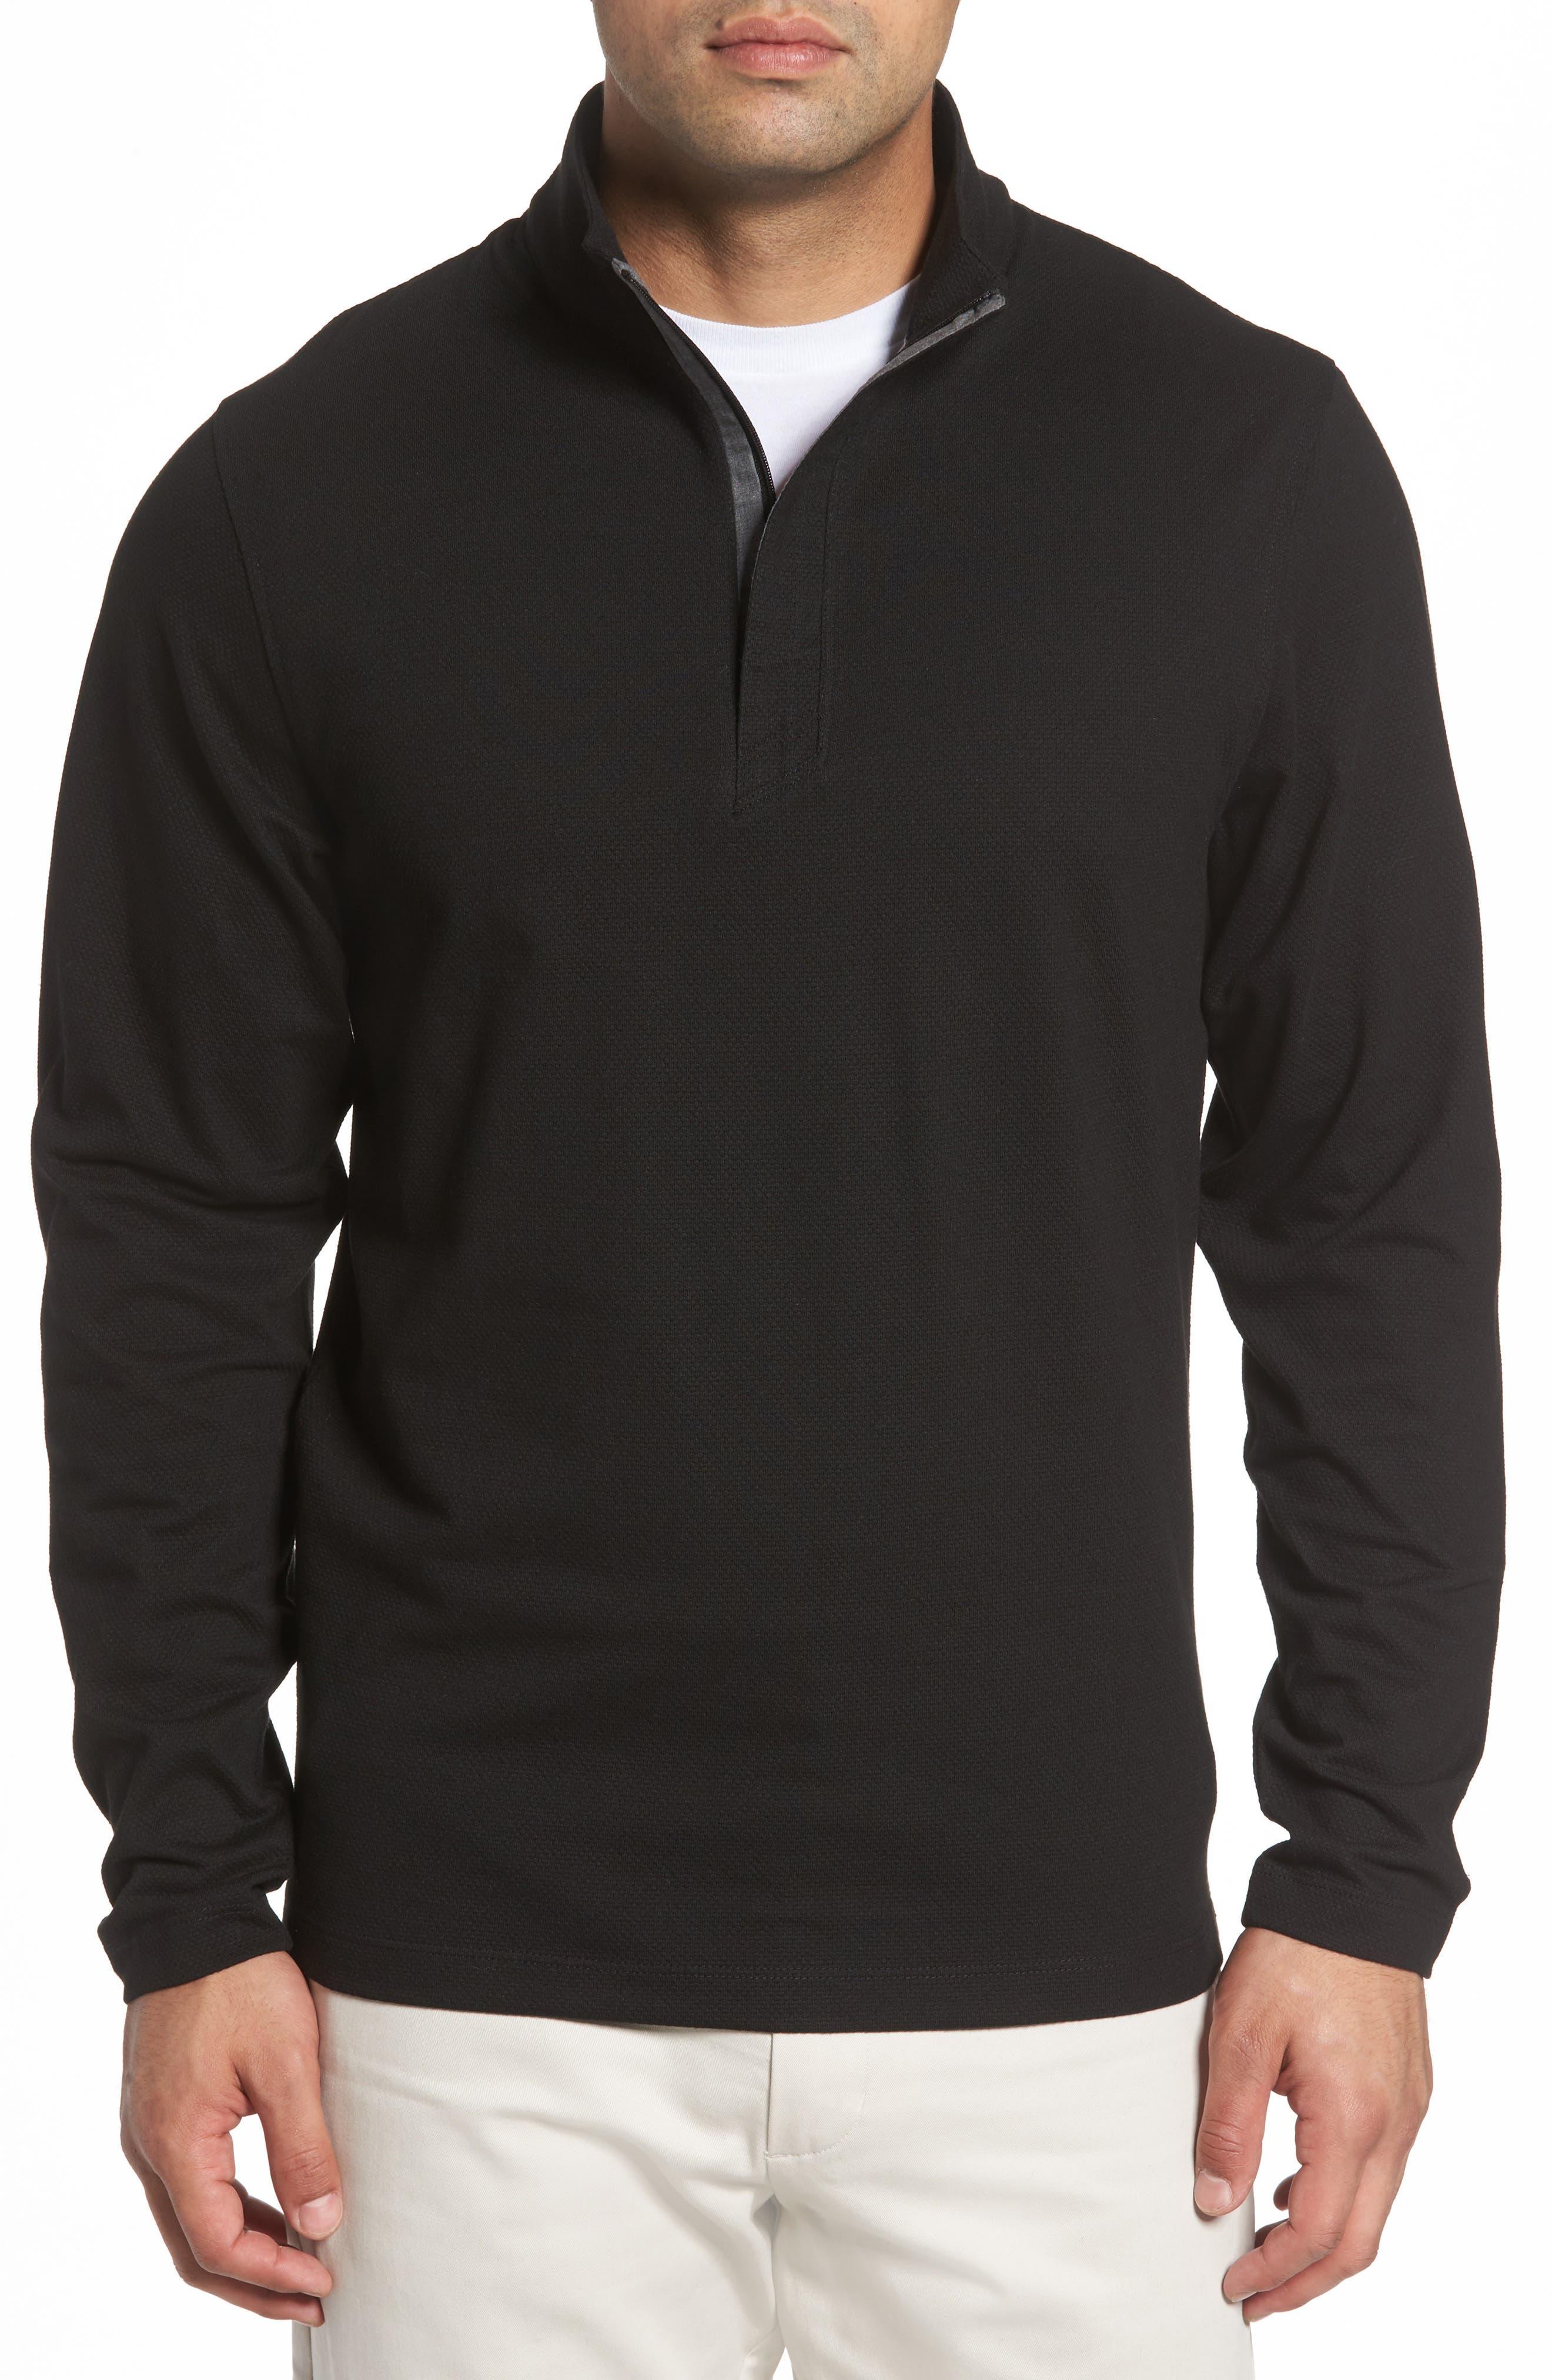 Hewitt Quarter-Zip Waffle Knit Pullover,                         Main,                         color, Black